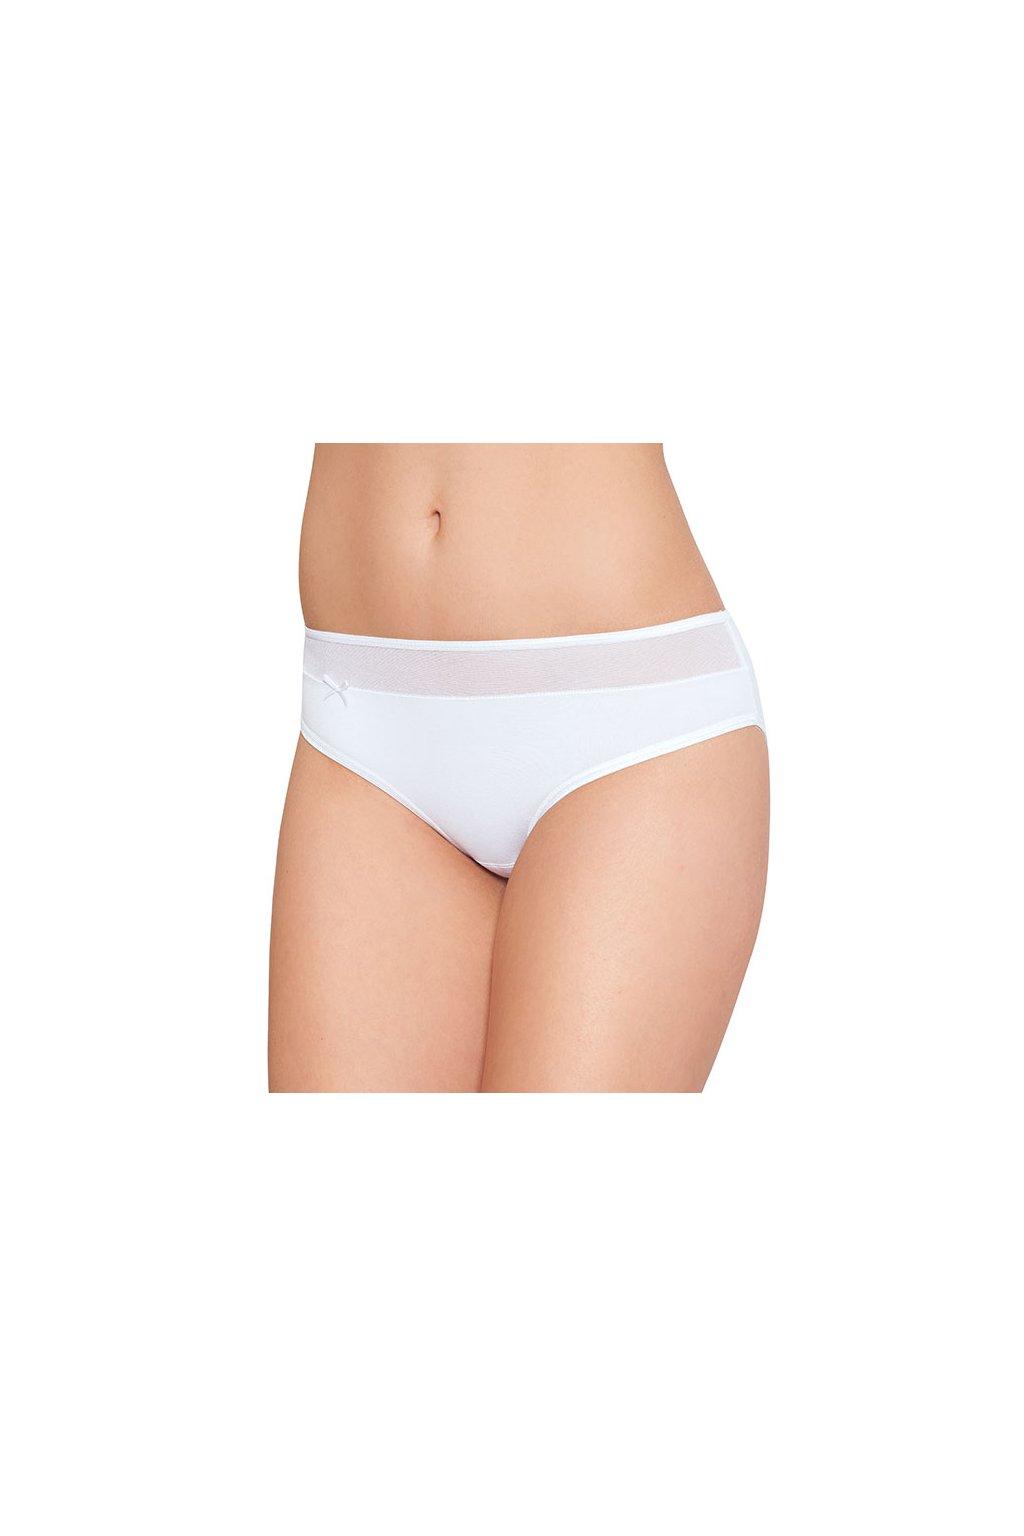 Dámské kalhotky, 10088 1, bílá